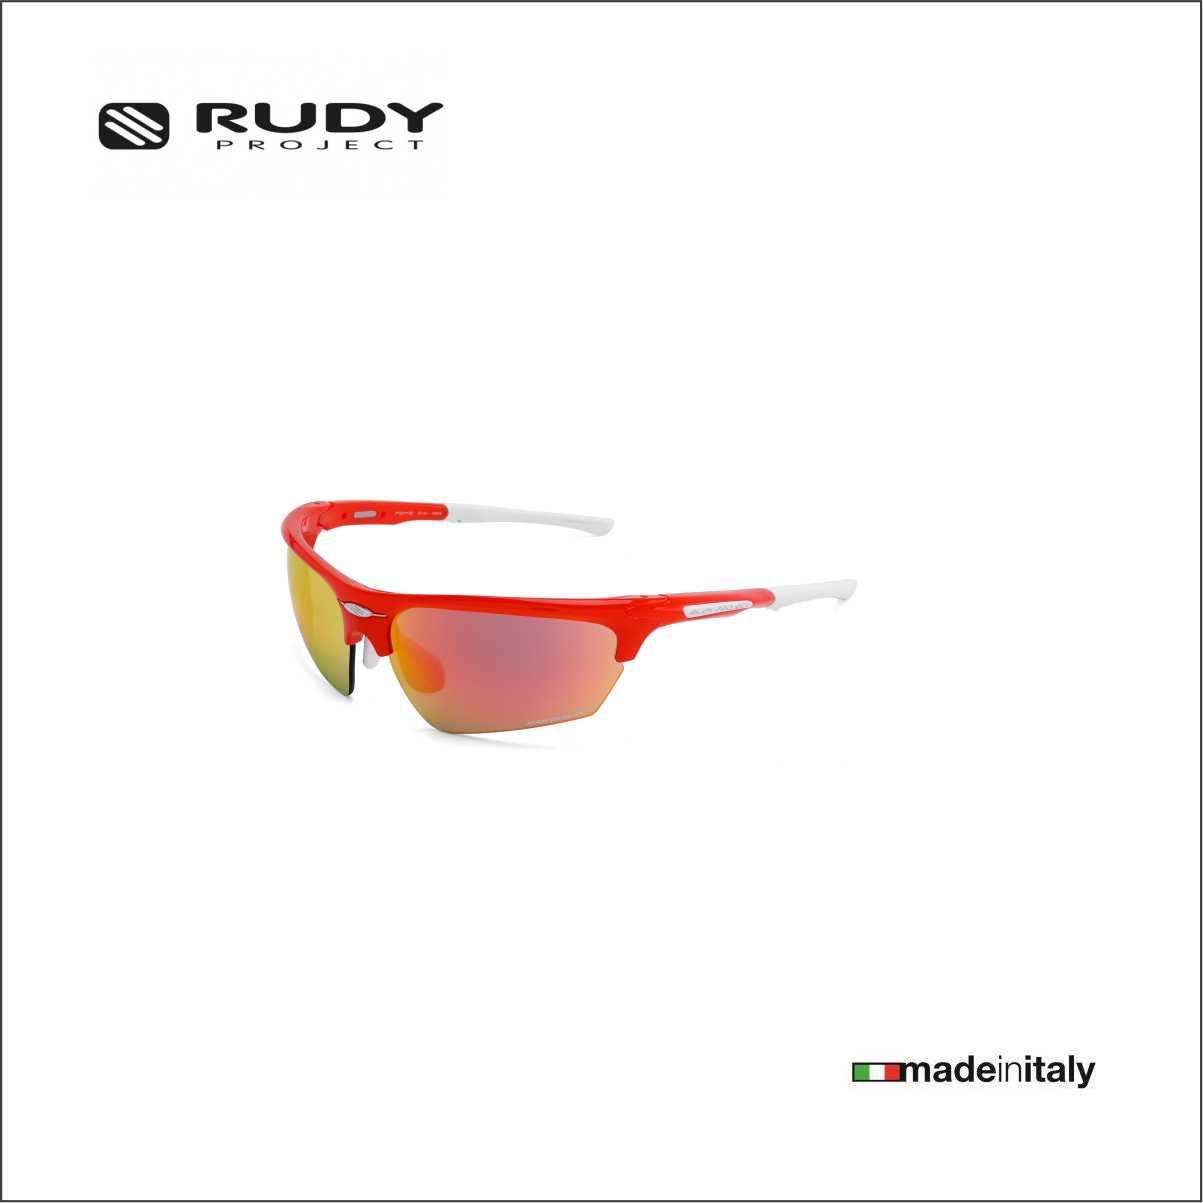 f8b881e8b6a Rudy Project Noyz Performance Eyewear in Tangerine with Multilaser Orange  Lenses SP044043MW